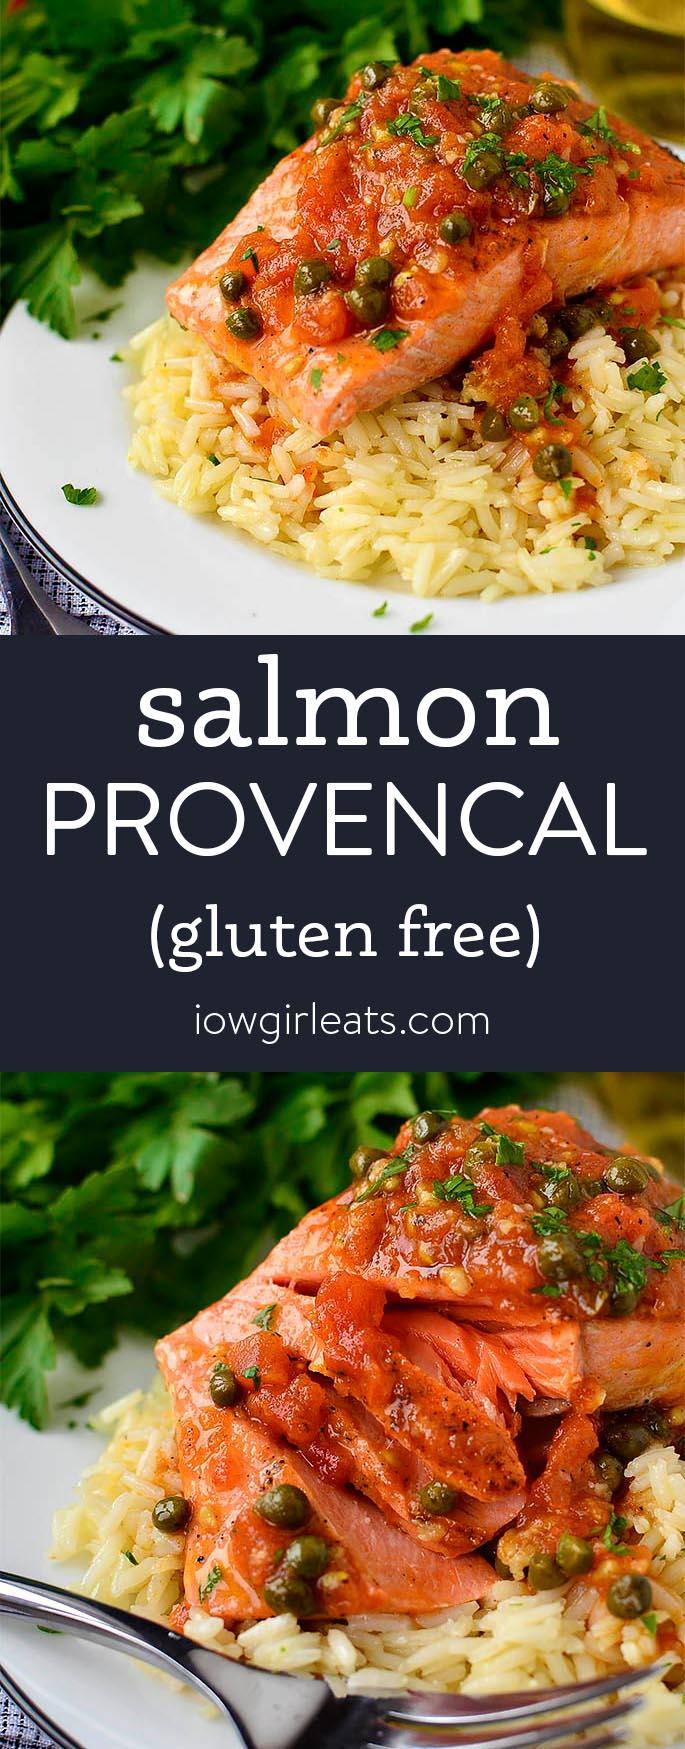 Photo collage of salmon provencal